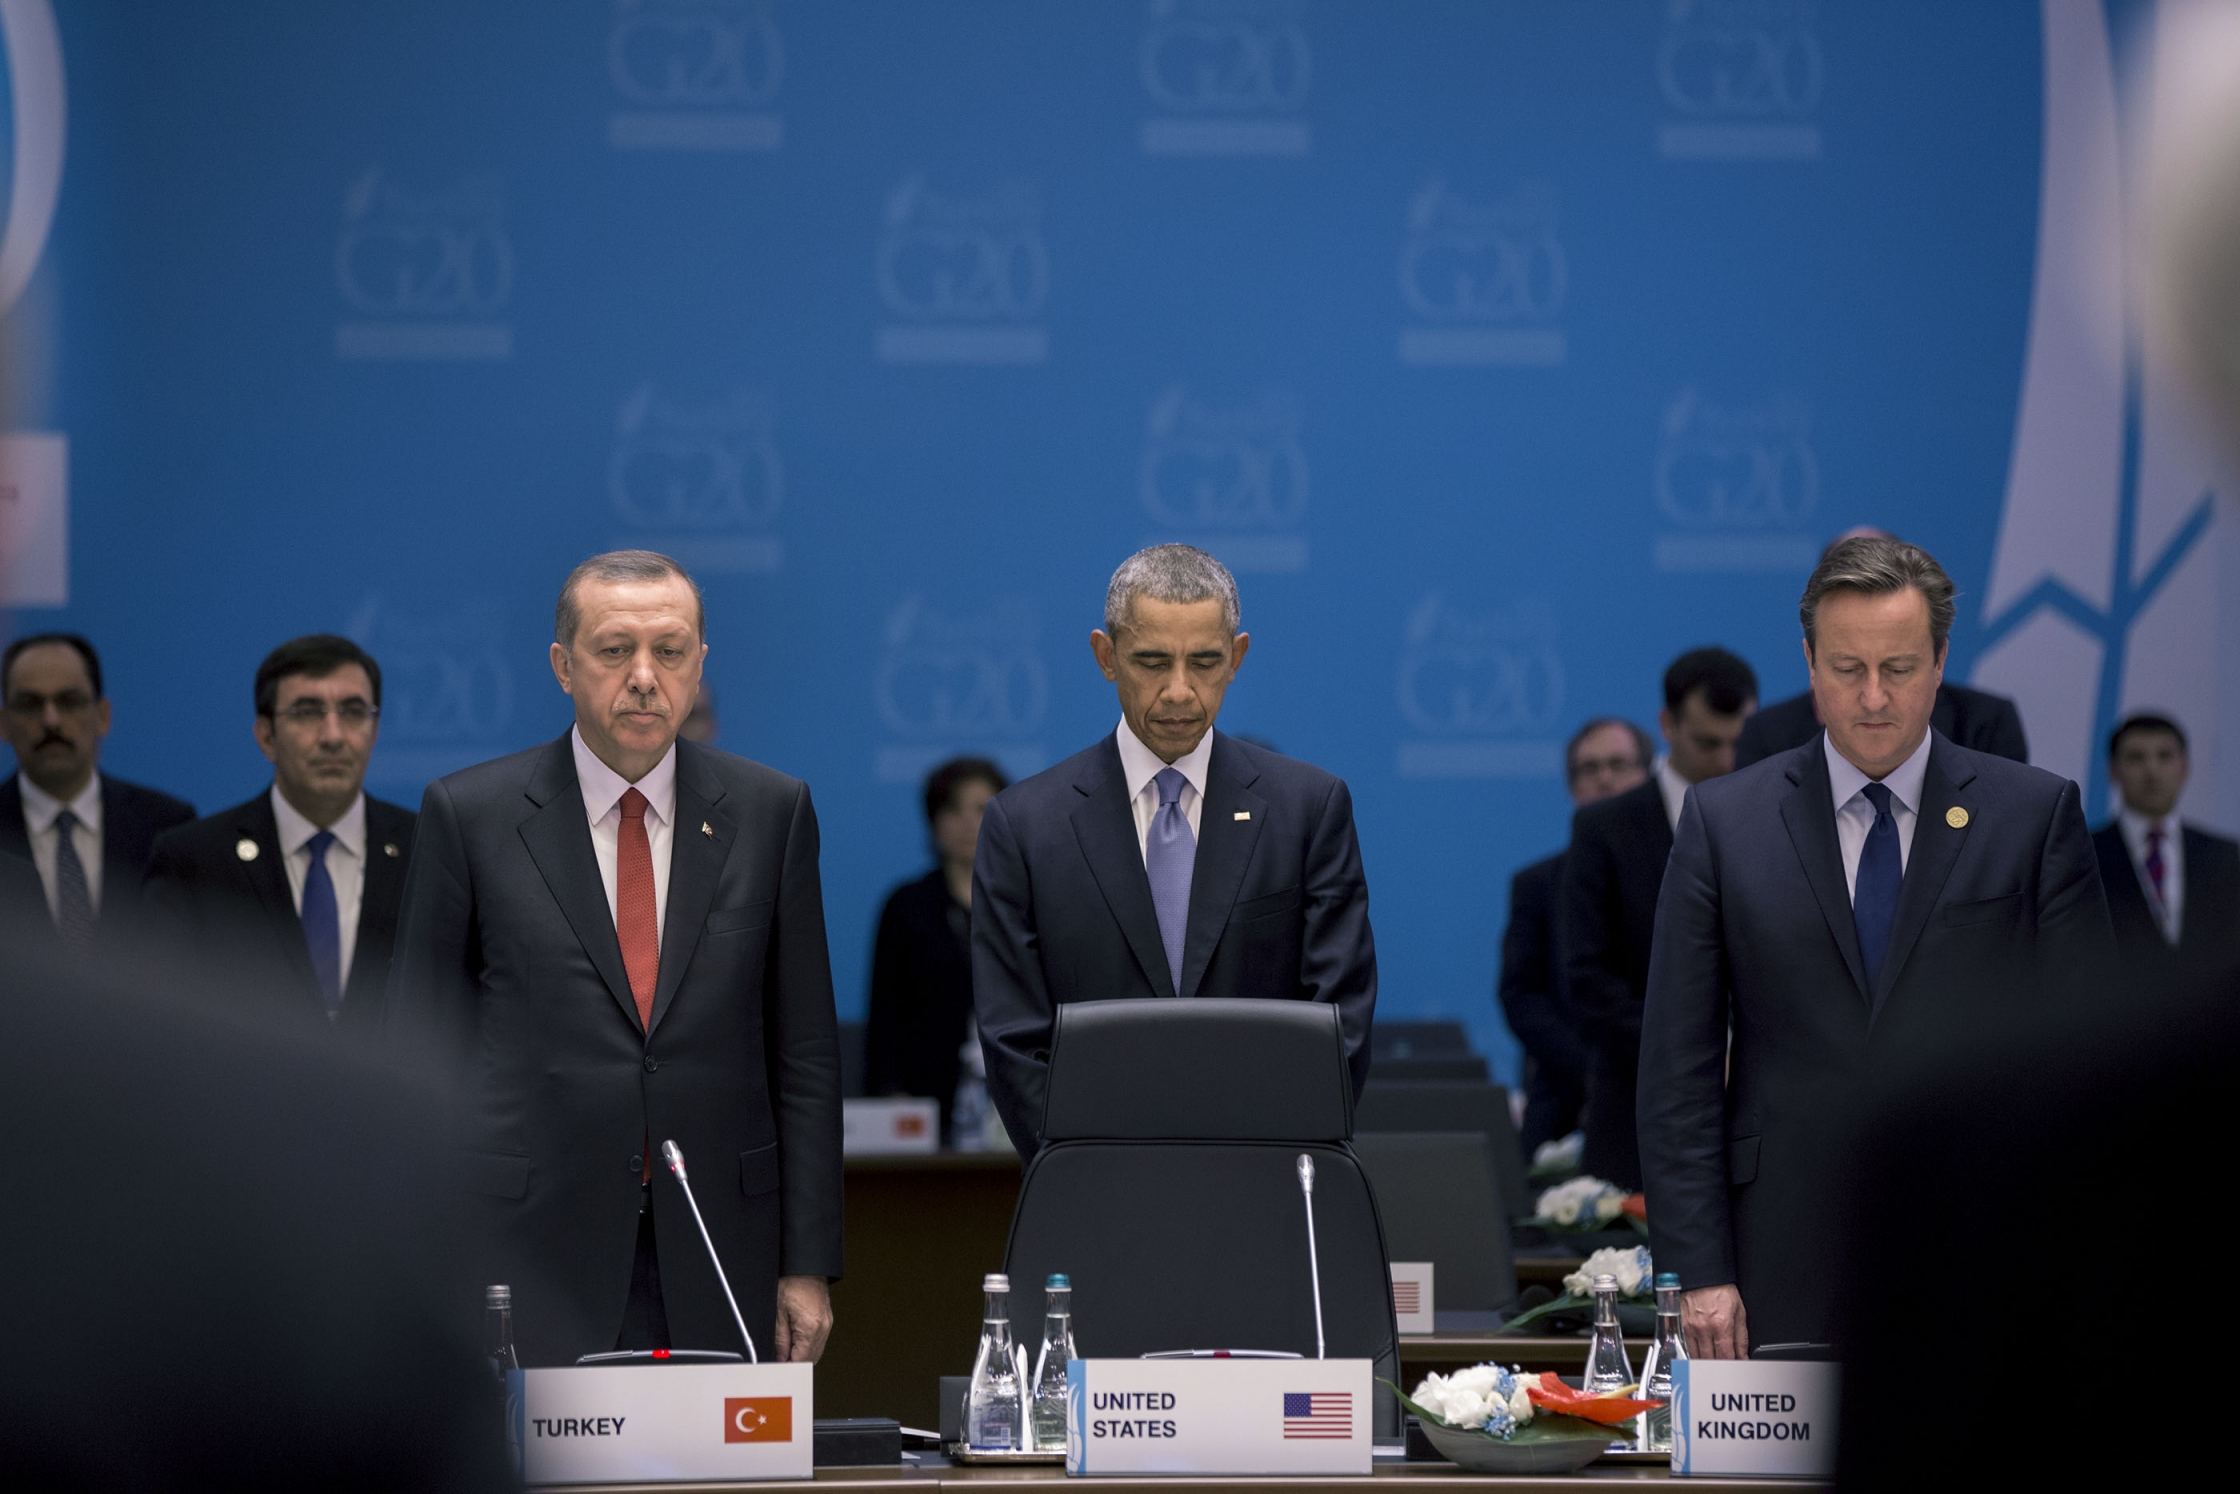 Recep_Tayyip_Erdoğan,_Barack_Obama_and_David_Cameron